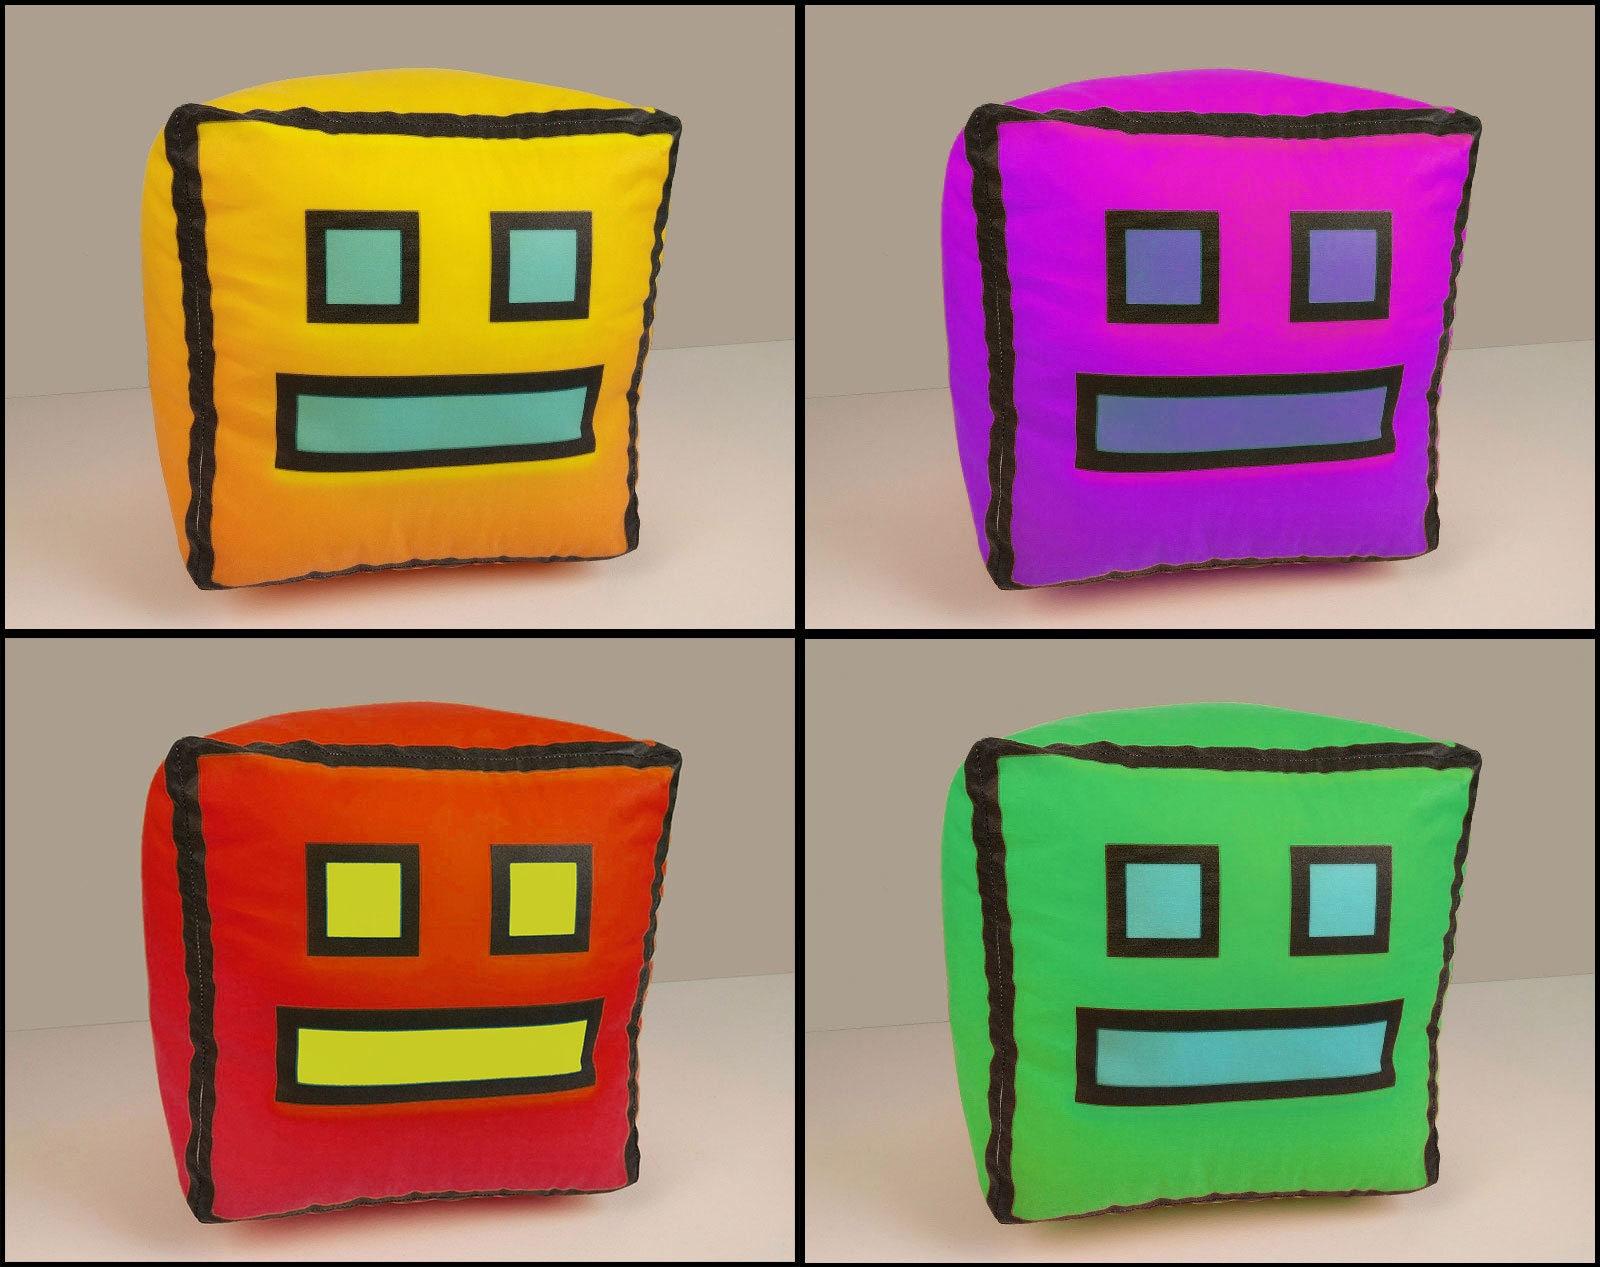 geometry dash full version apk free ios